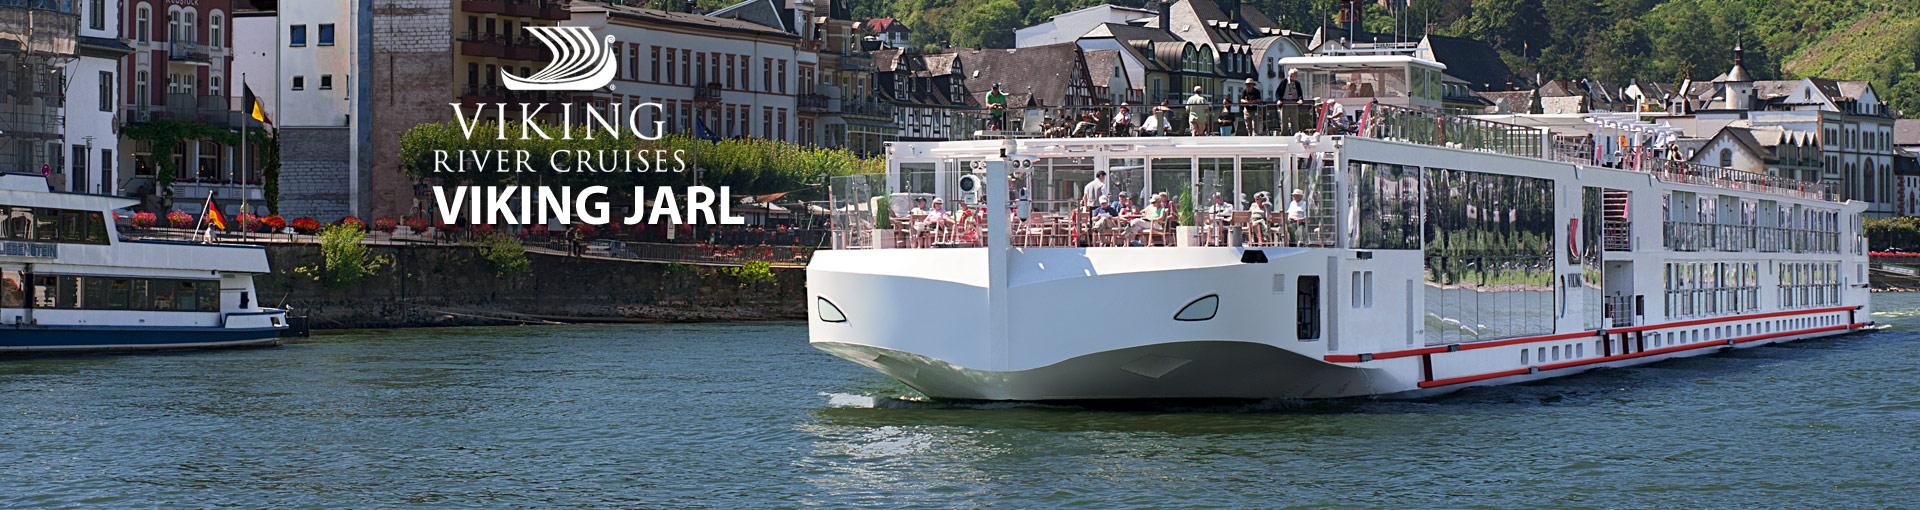 Viking Rivers Viking Jarl river cruise ship